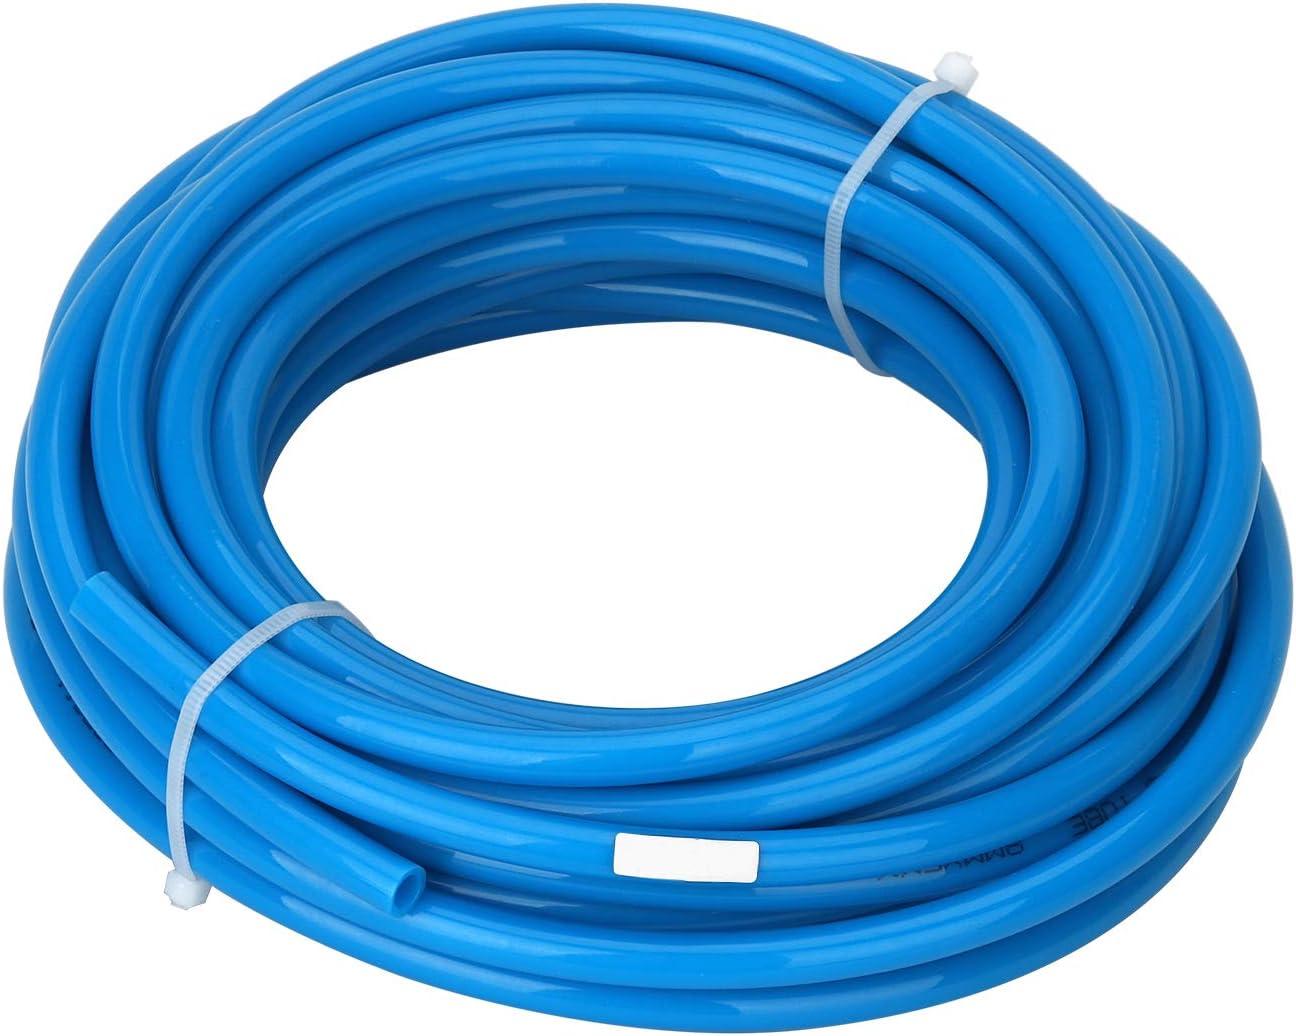 Dia 8mm//12mm Resist High-Temperature//Pressure//Abrasion 16.4ft Surprecision PU Plastic Air Hose Tube Durable Length 5m